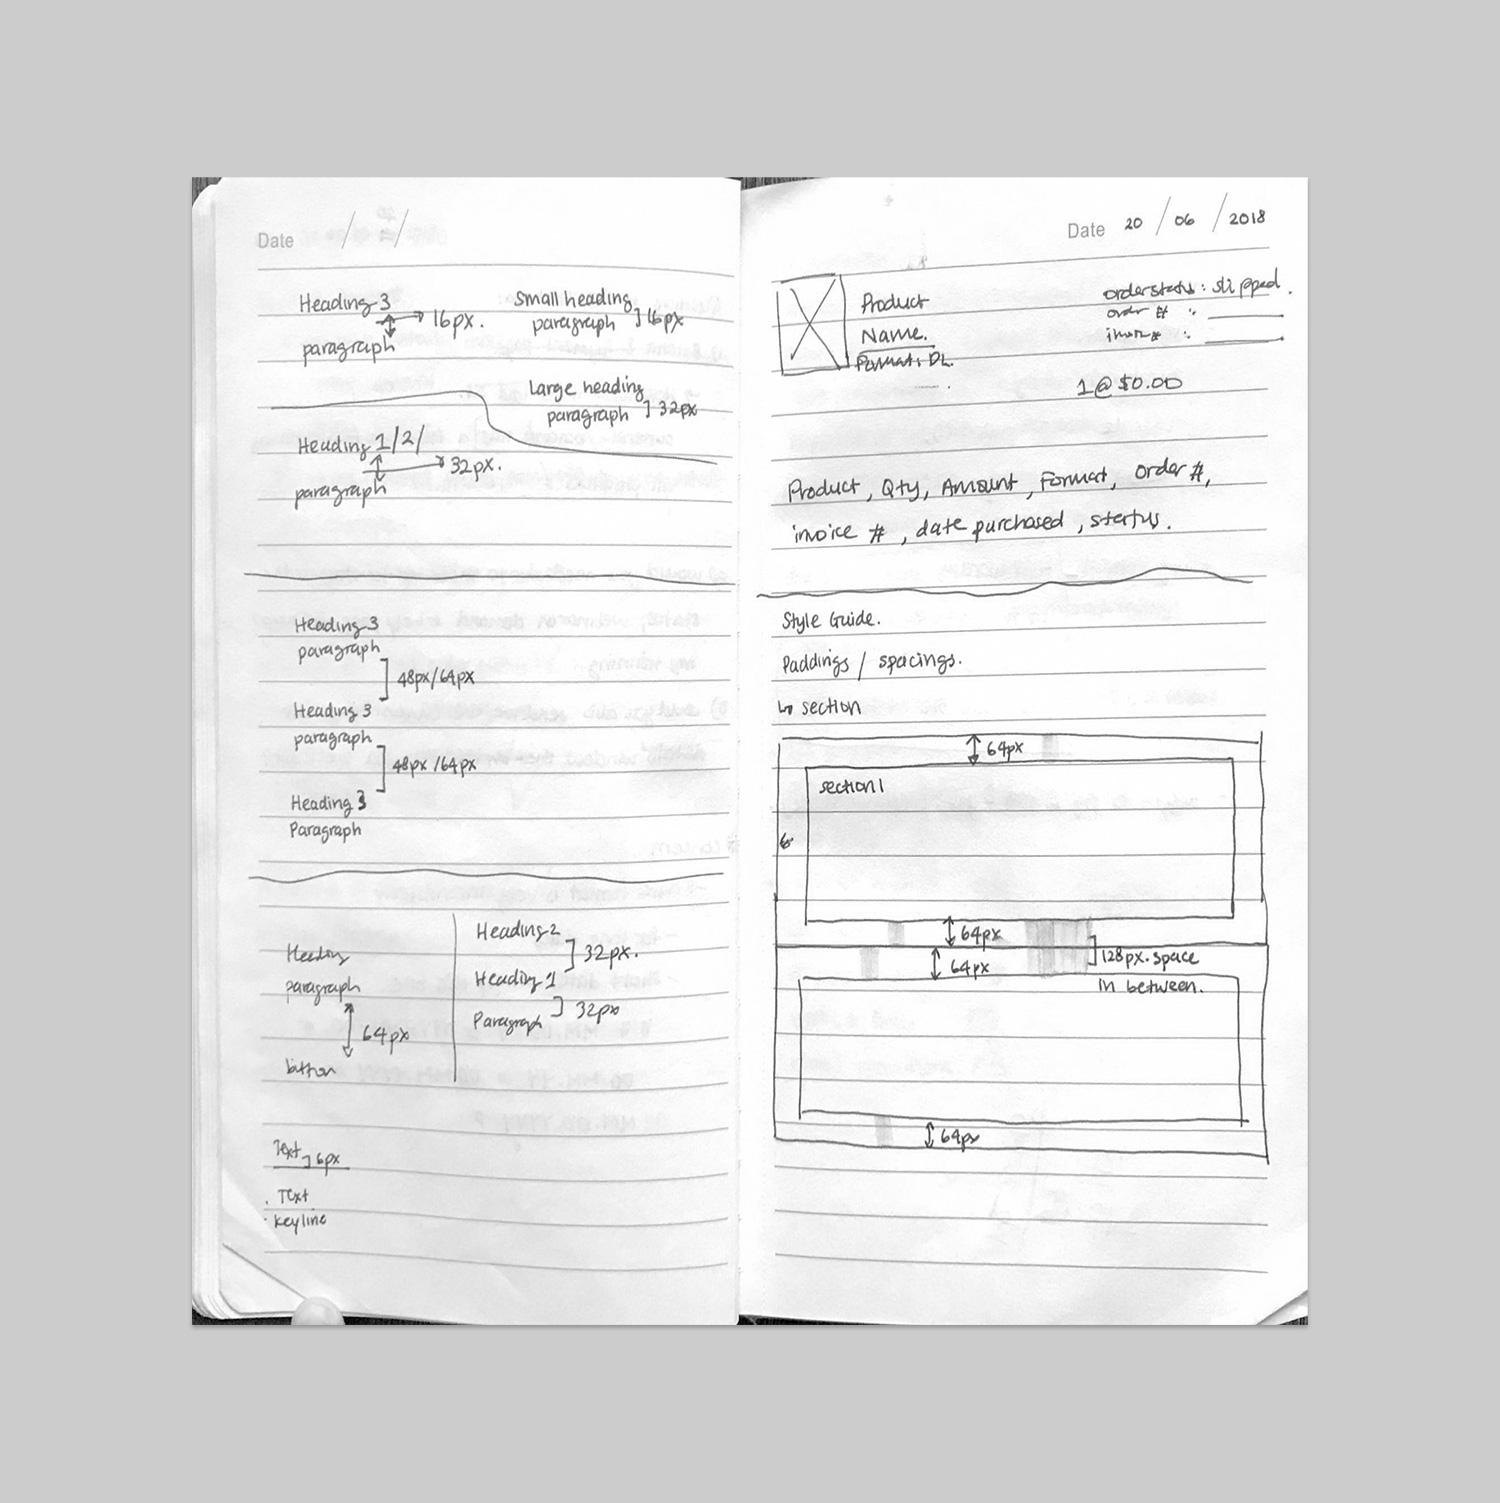 WK_Process-06